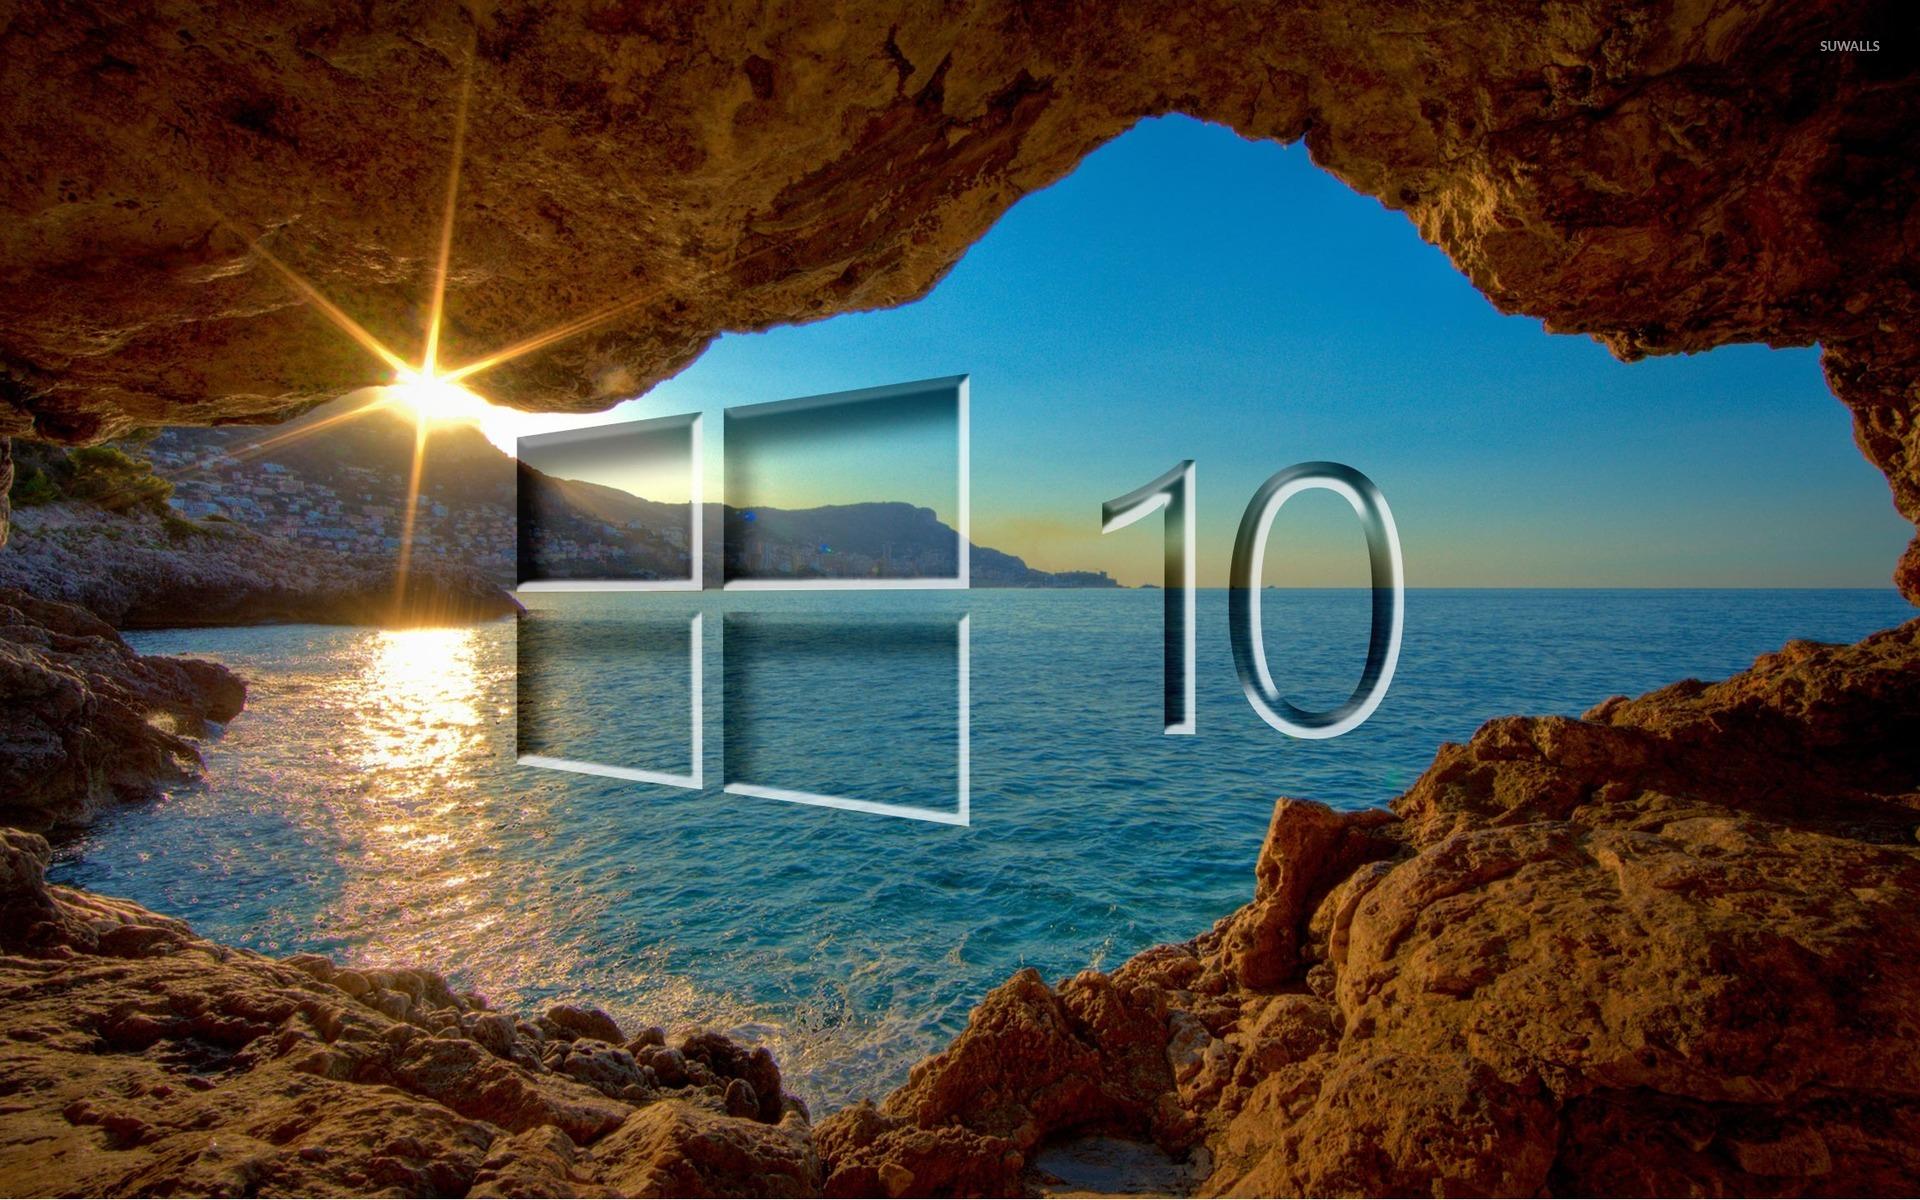 Windows 10 Over The Cave Transparent Logo Wallpaper